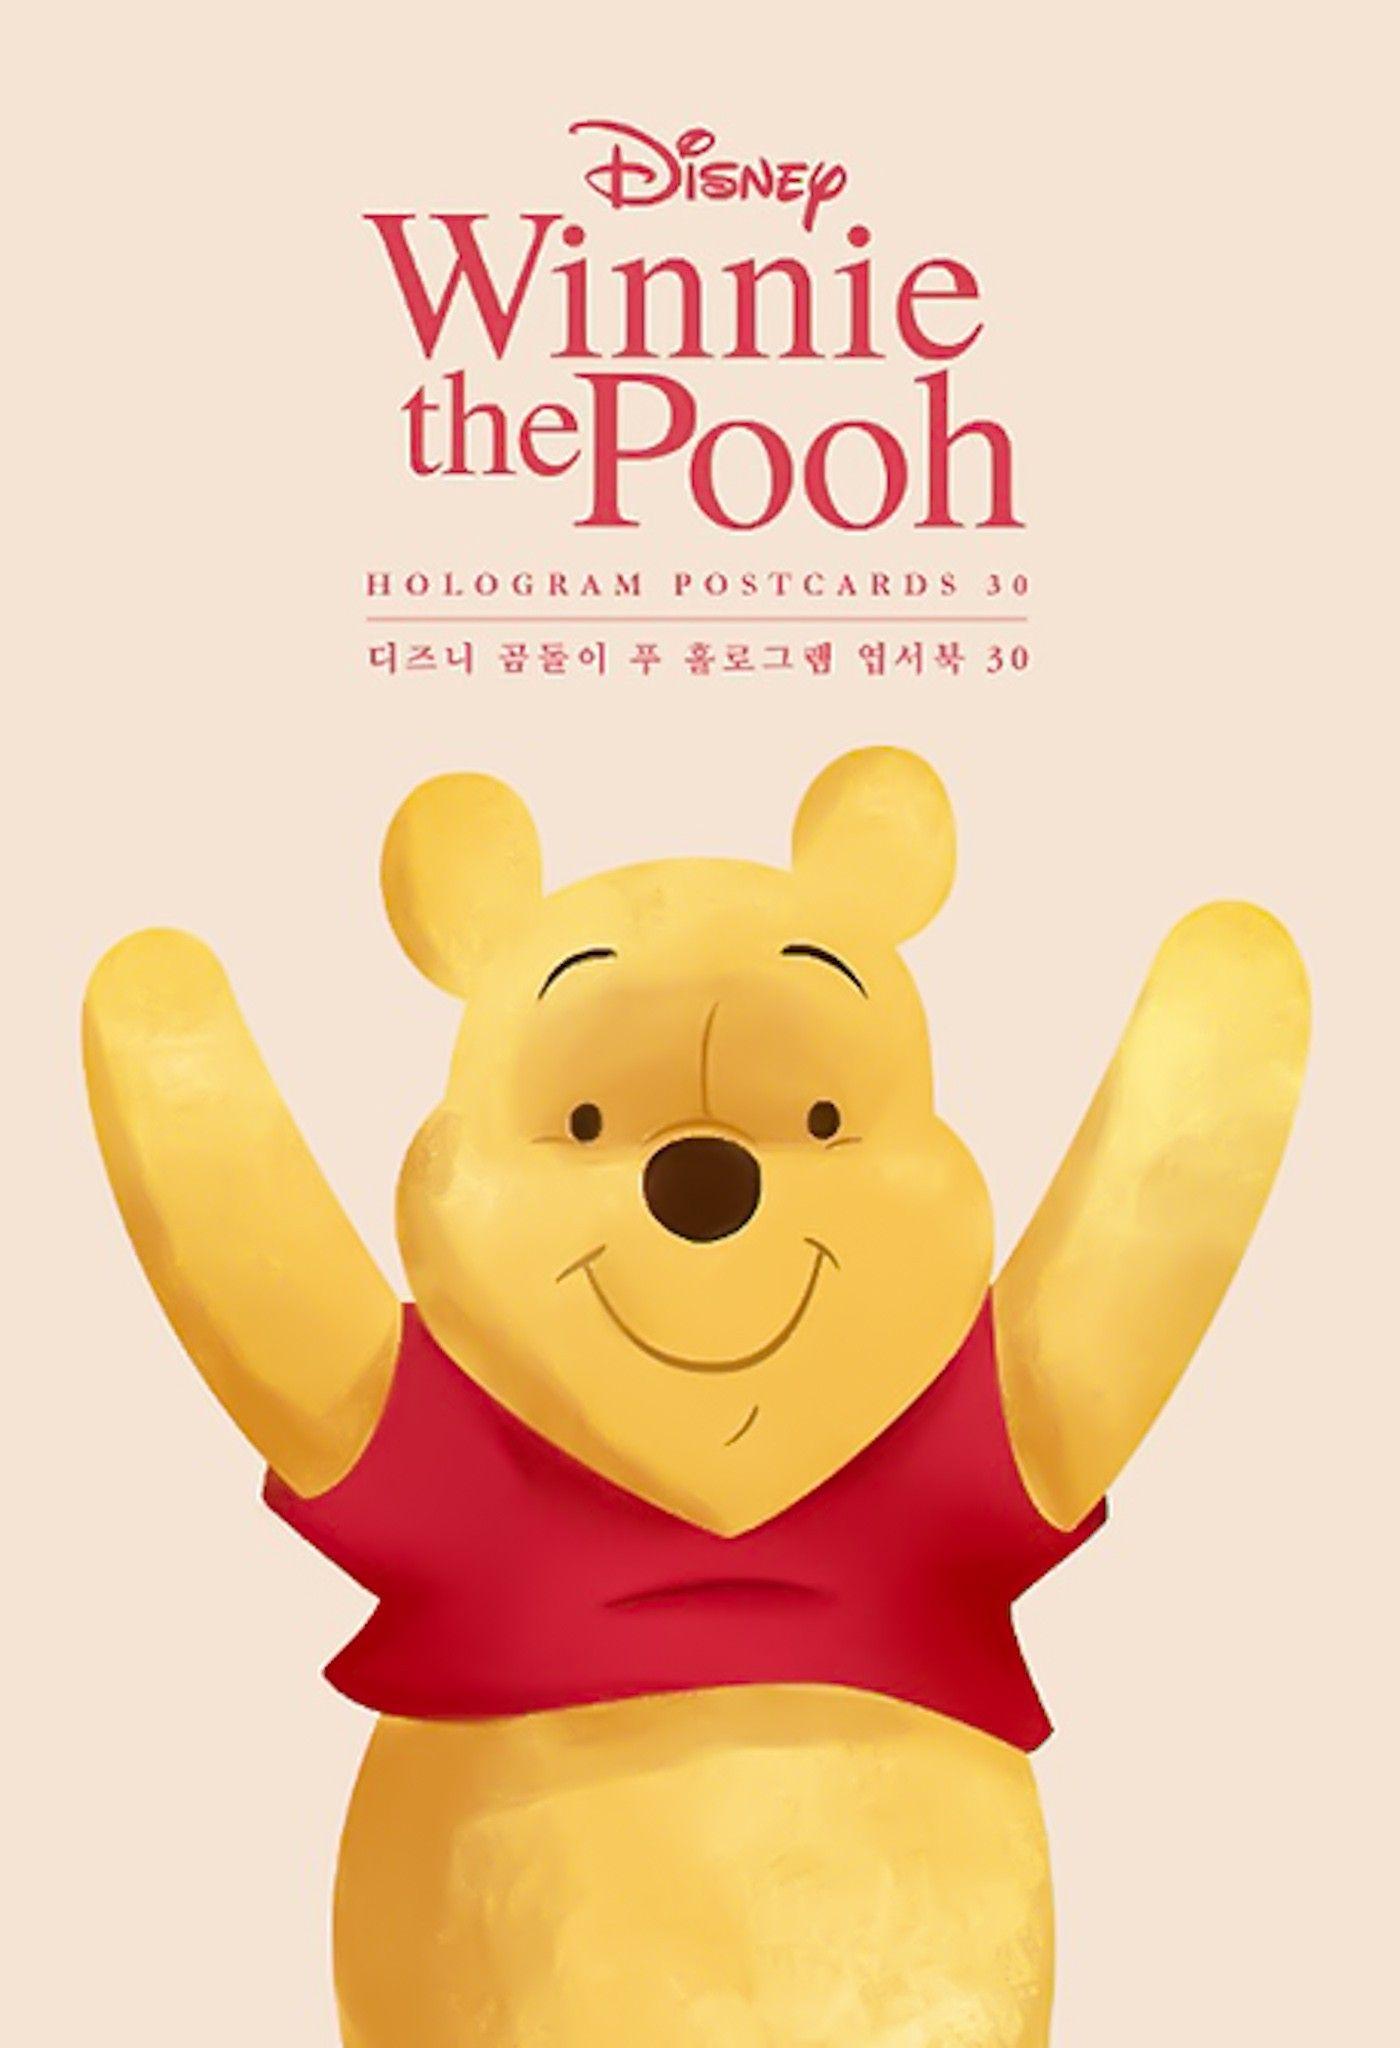 660 Gambar Winnie The Pooh Terbaik Di 2020 Kartun Lucu Pooh Bear